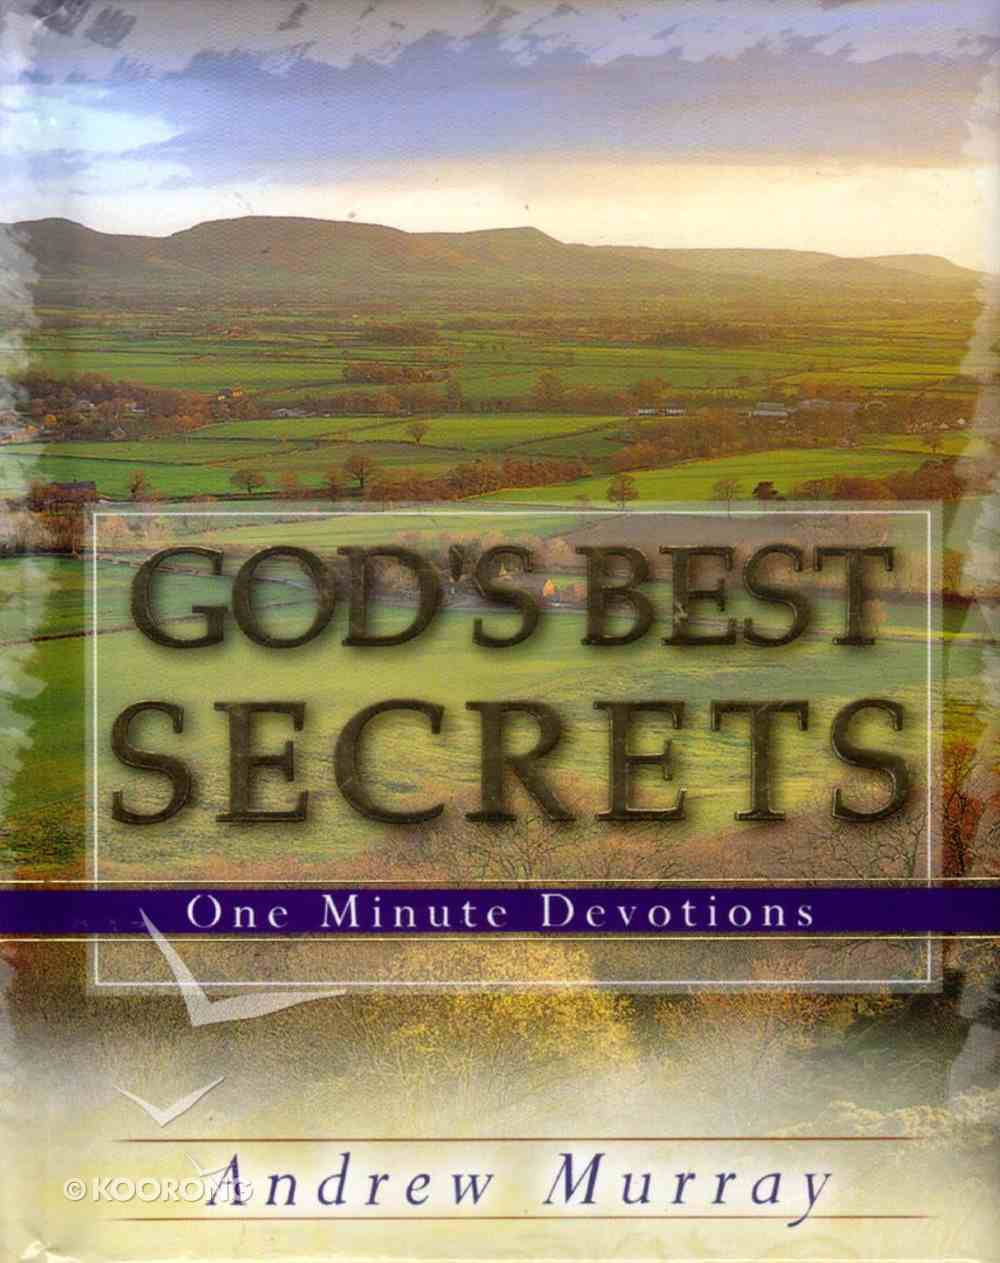 One Minute Devotions: God's Best Secrets Hardback